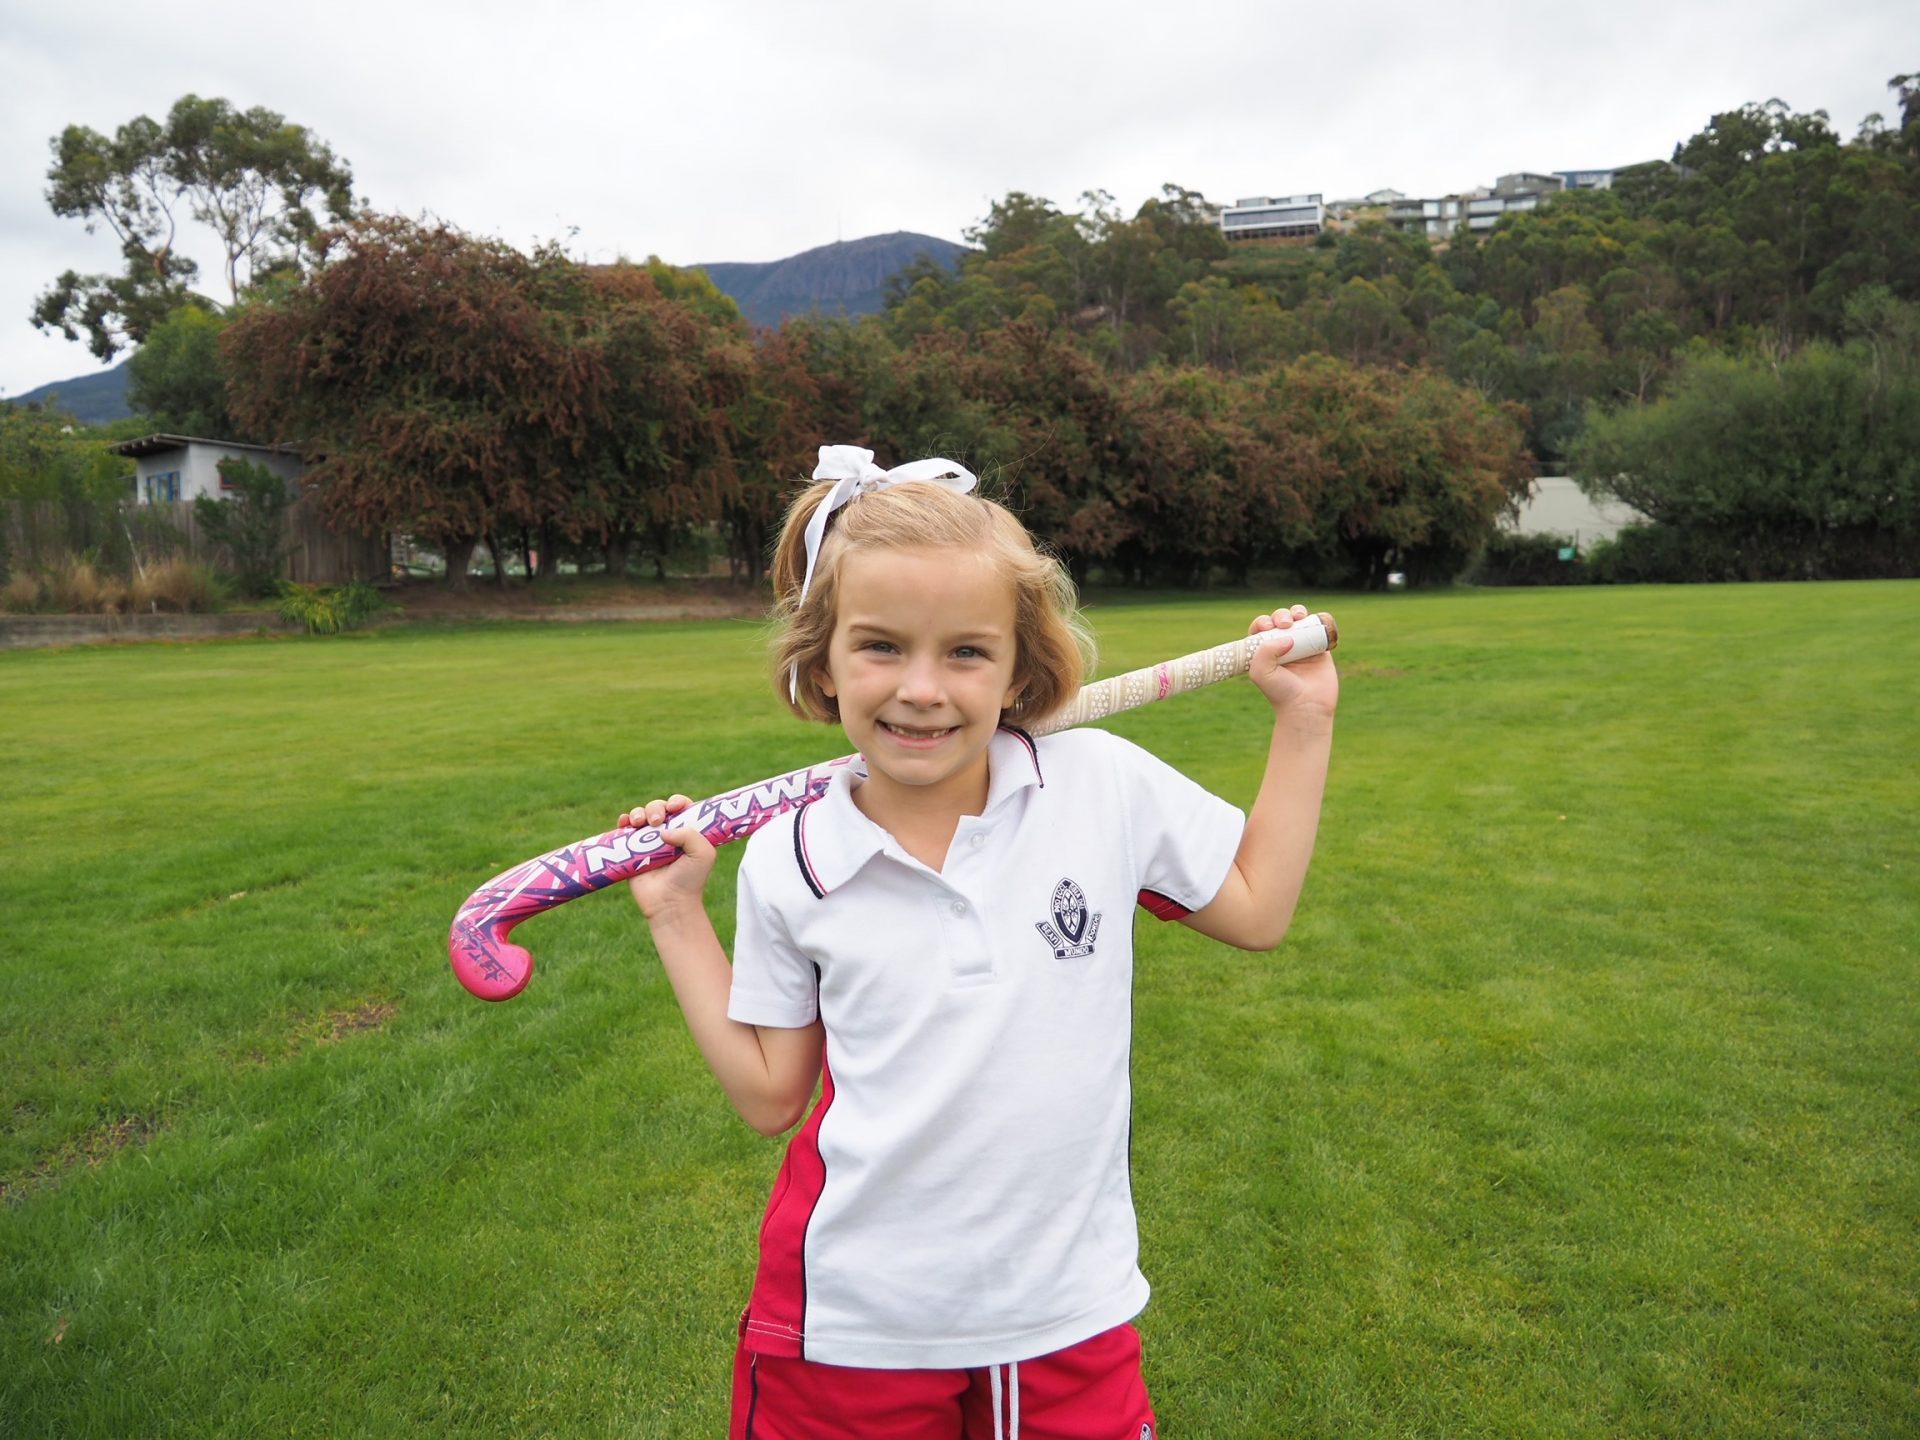 Student posing with Hockey Stick